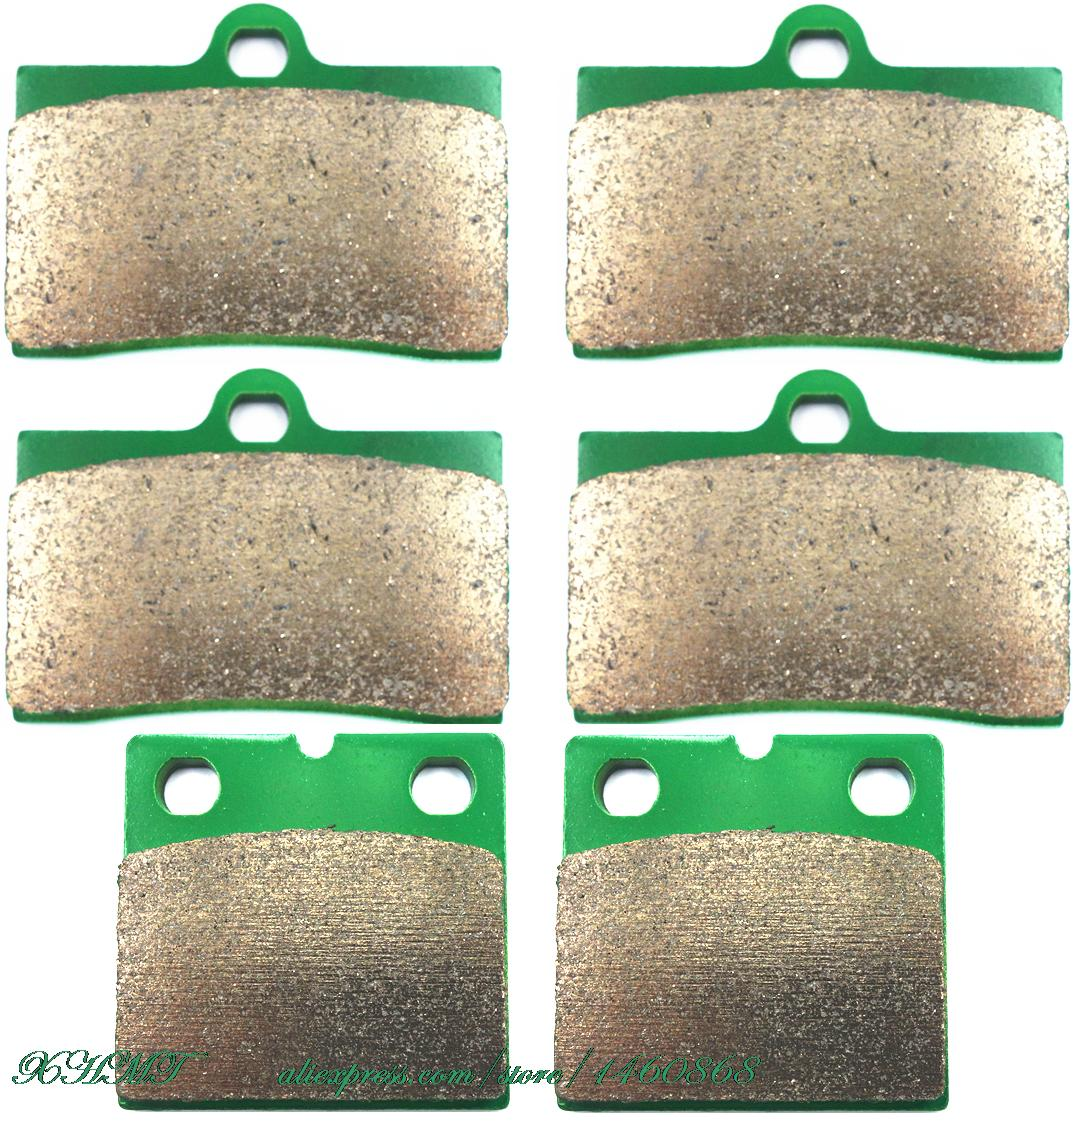 Brake Shoe Pads Set For Moto Guzzi Daytona 1000 1991 1992 1993 1994 1995 1996 1997 / Ducati 750 Endurance Laguna Seca 1987 & Up